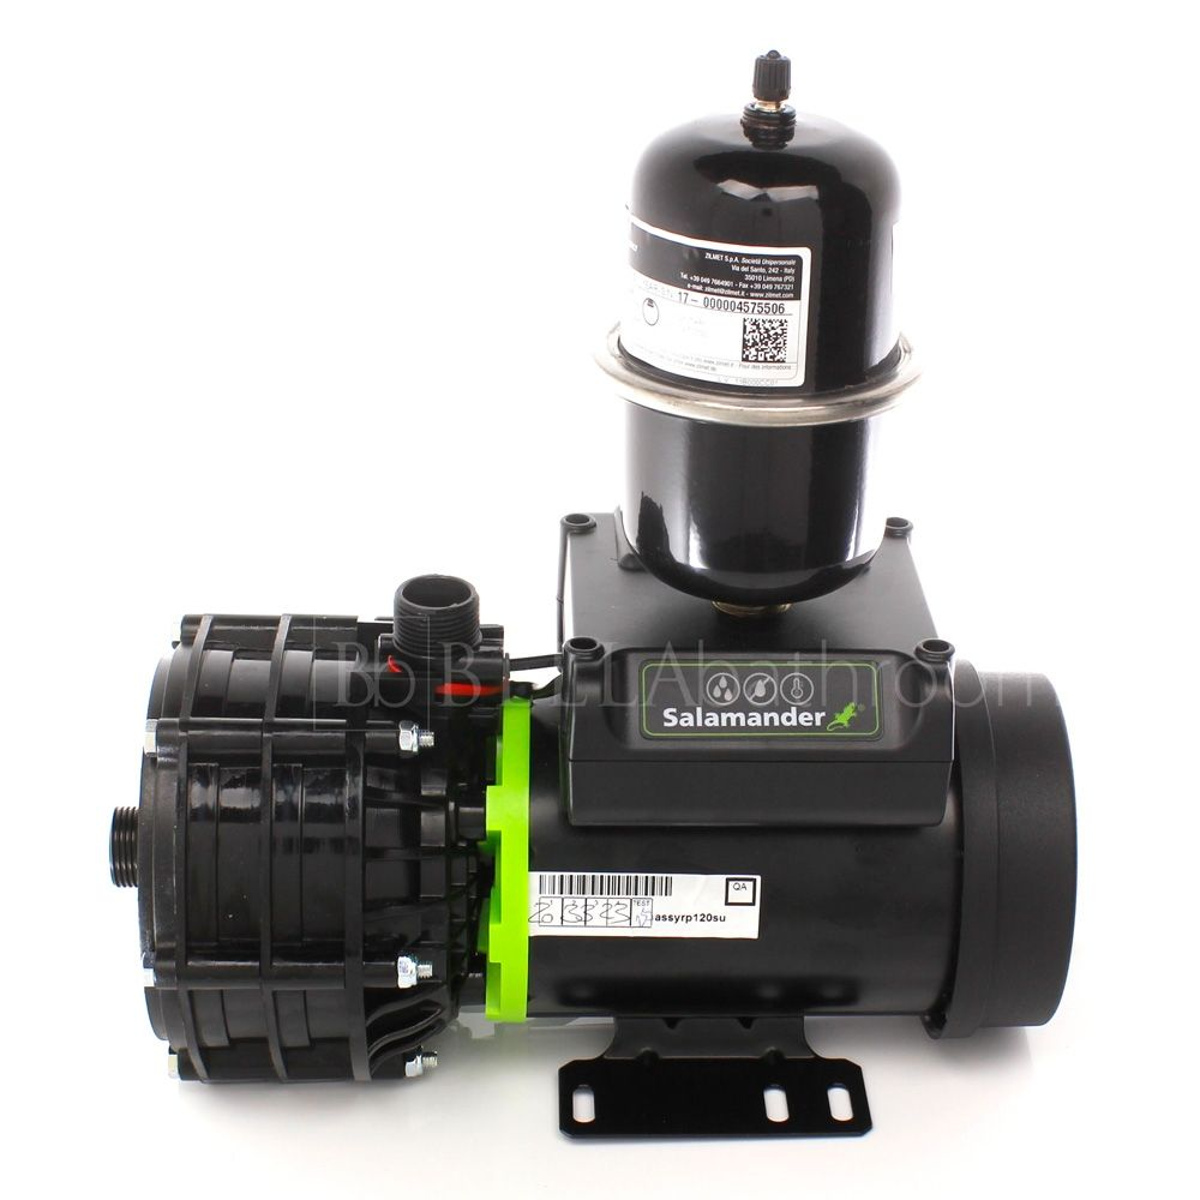 Salamander RP120SU 3.6 Bar Single Universal Whole House Shower Pump Back